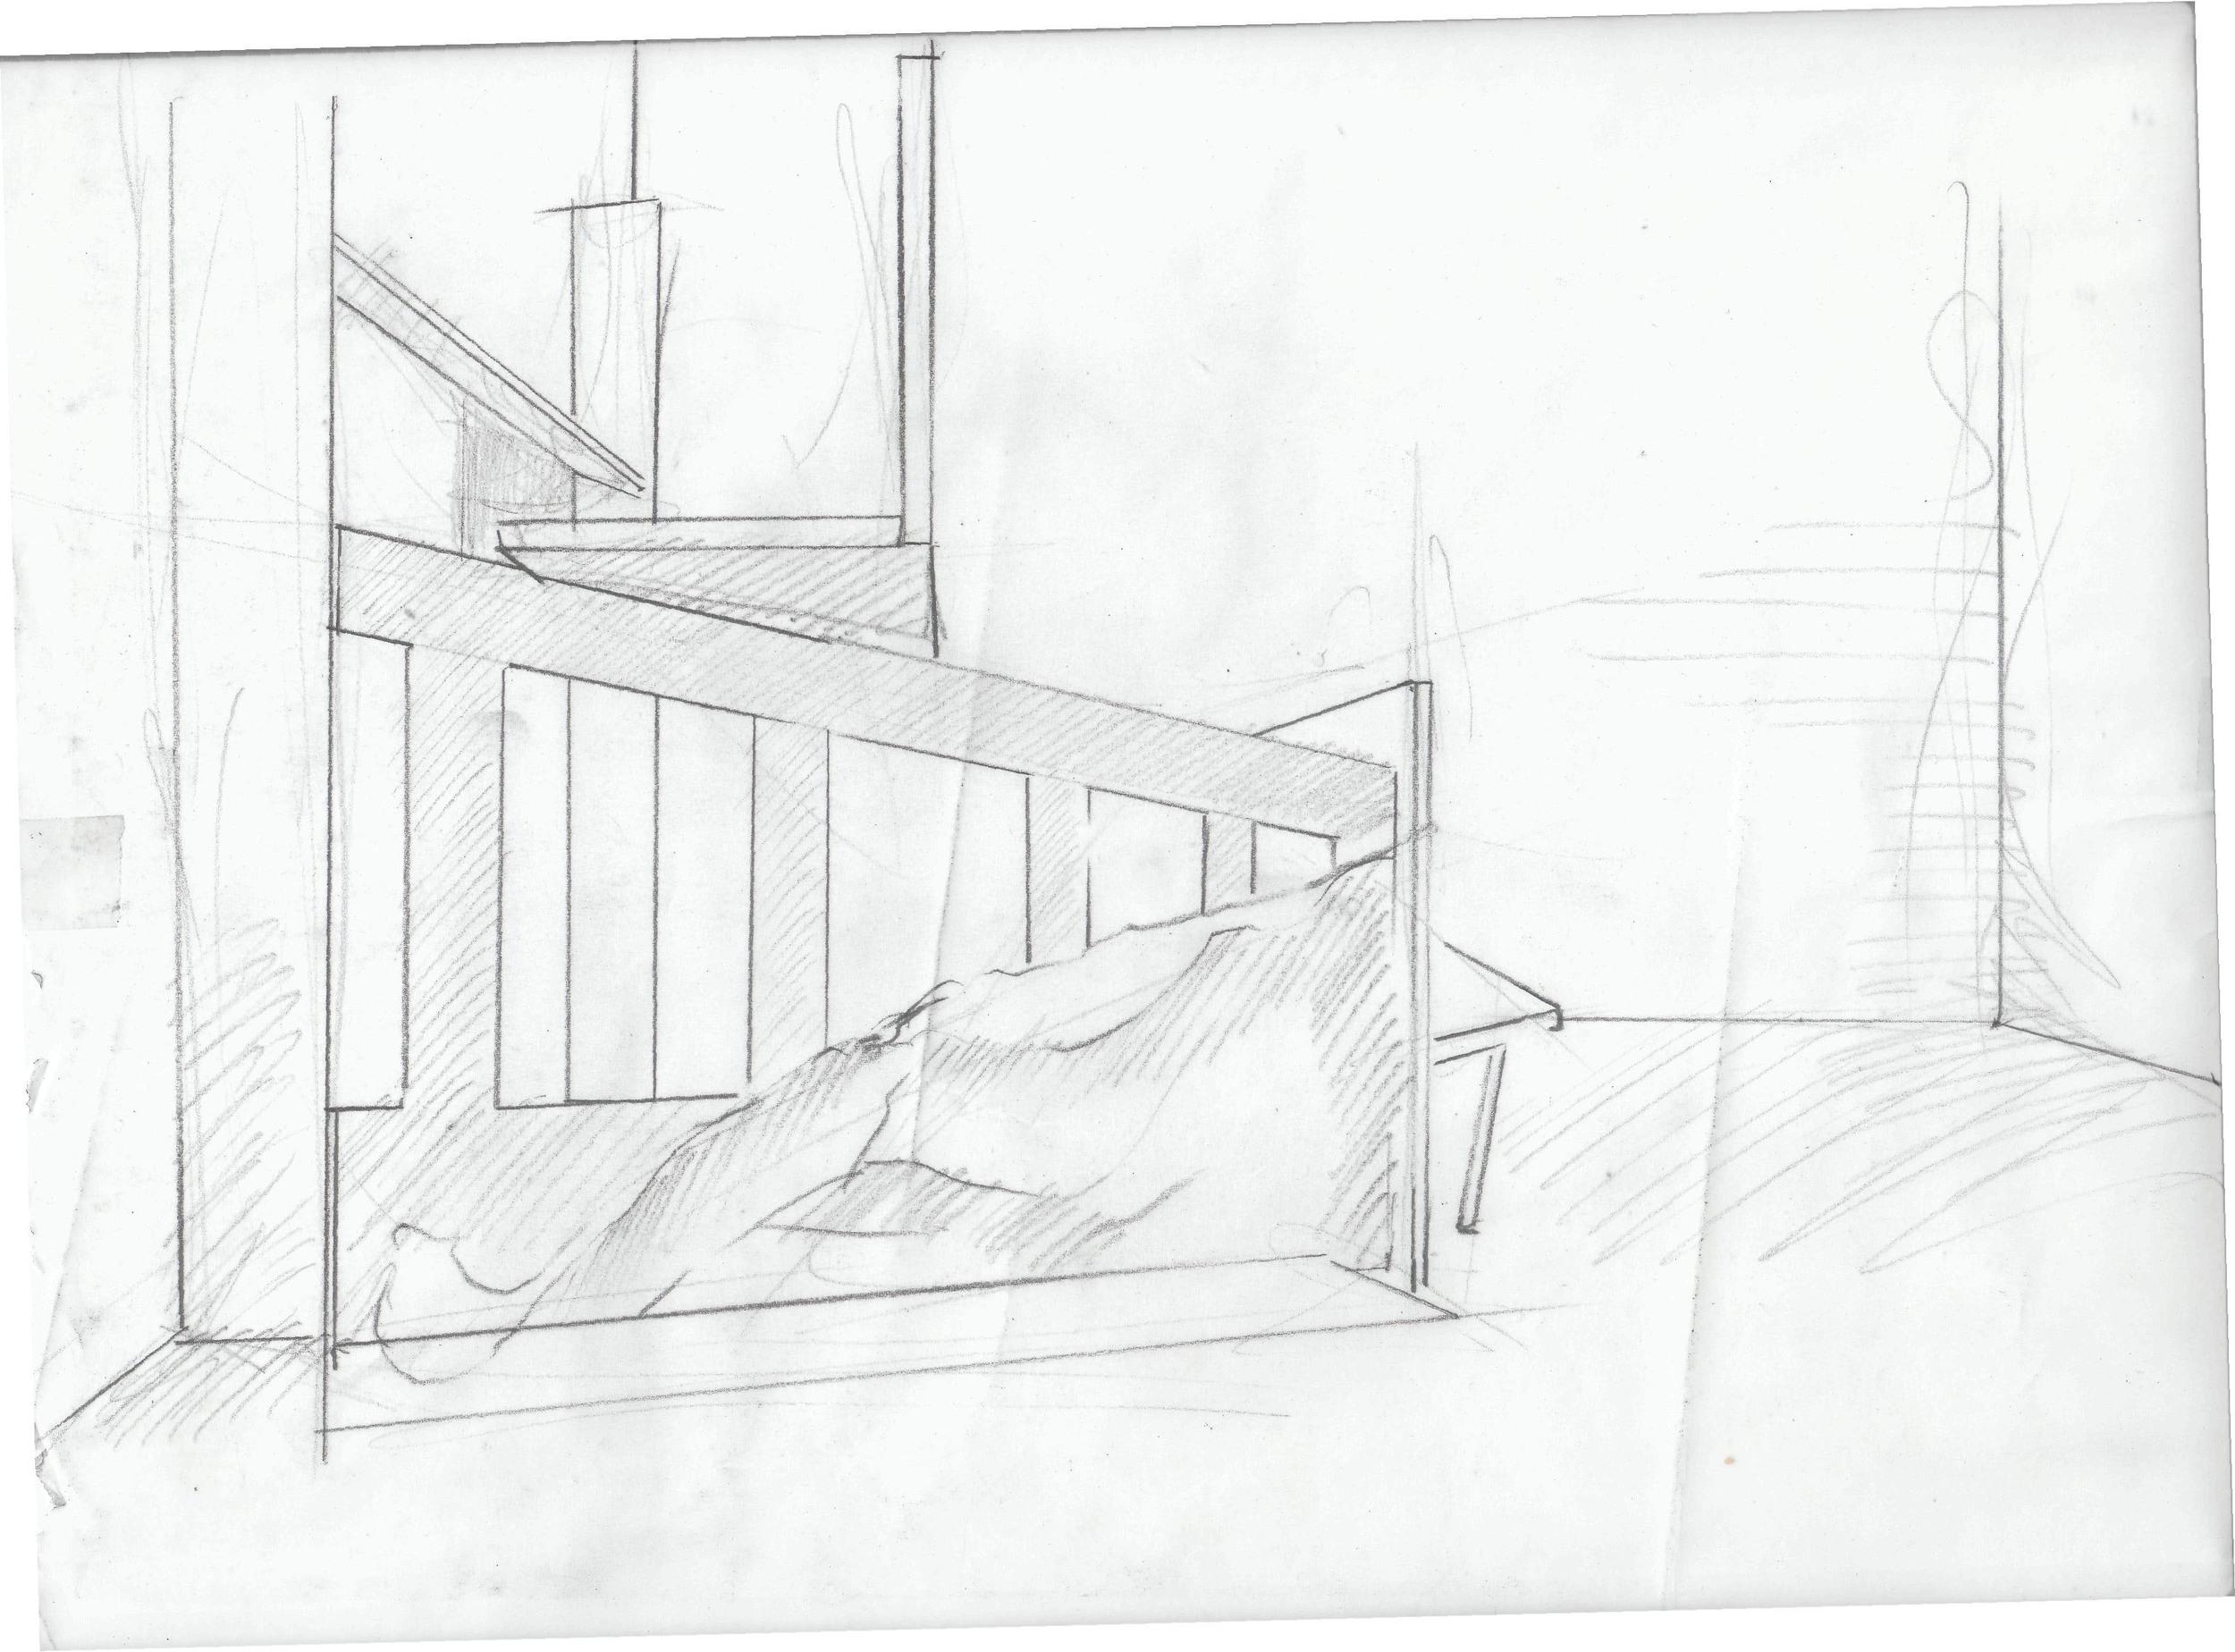 bb4.jpg